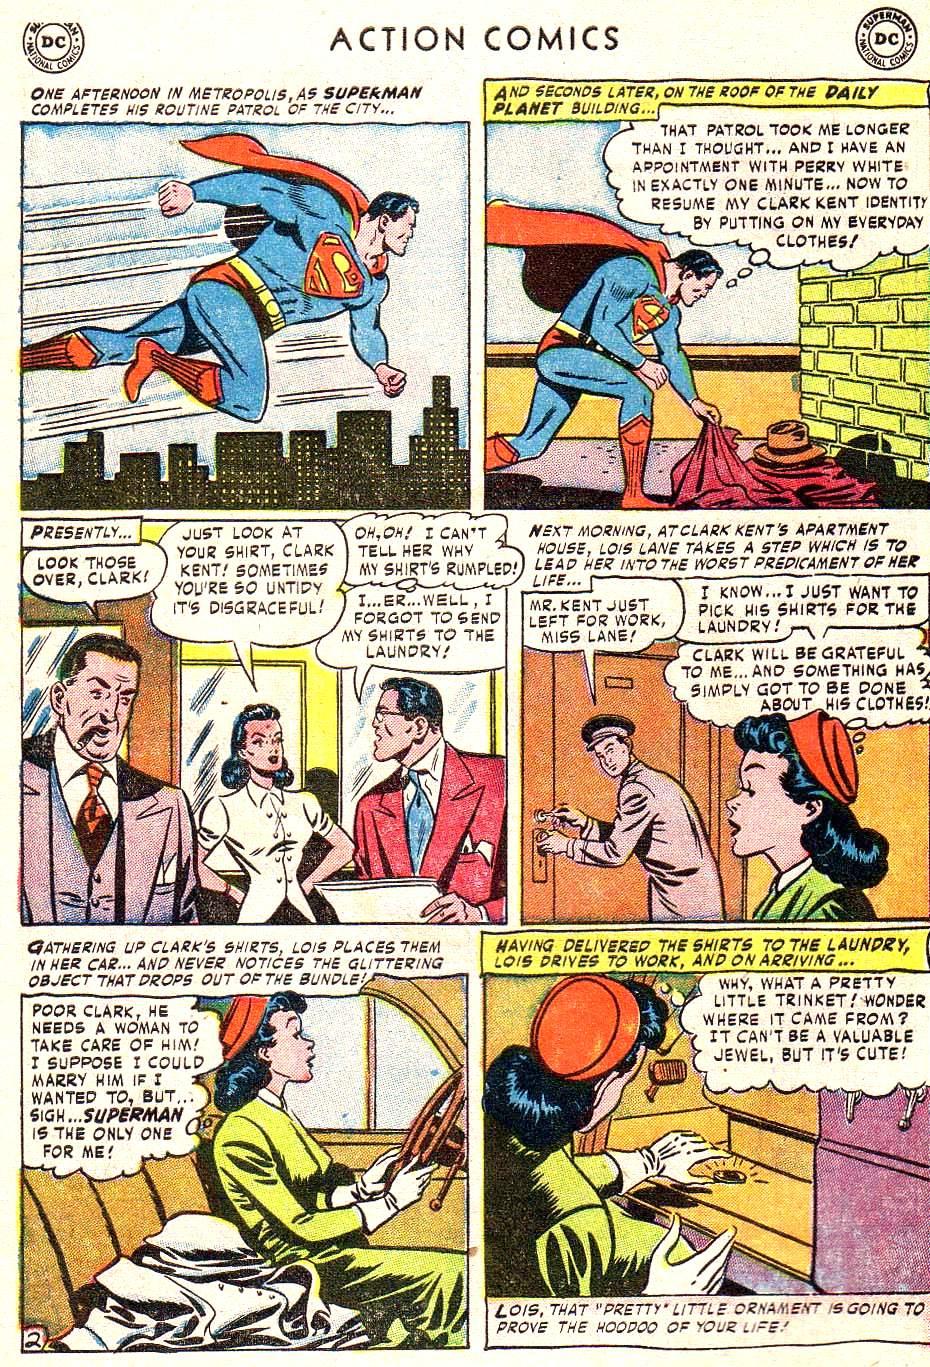 Action Comics (1938) 172 Page 3